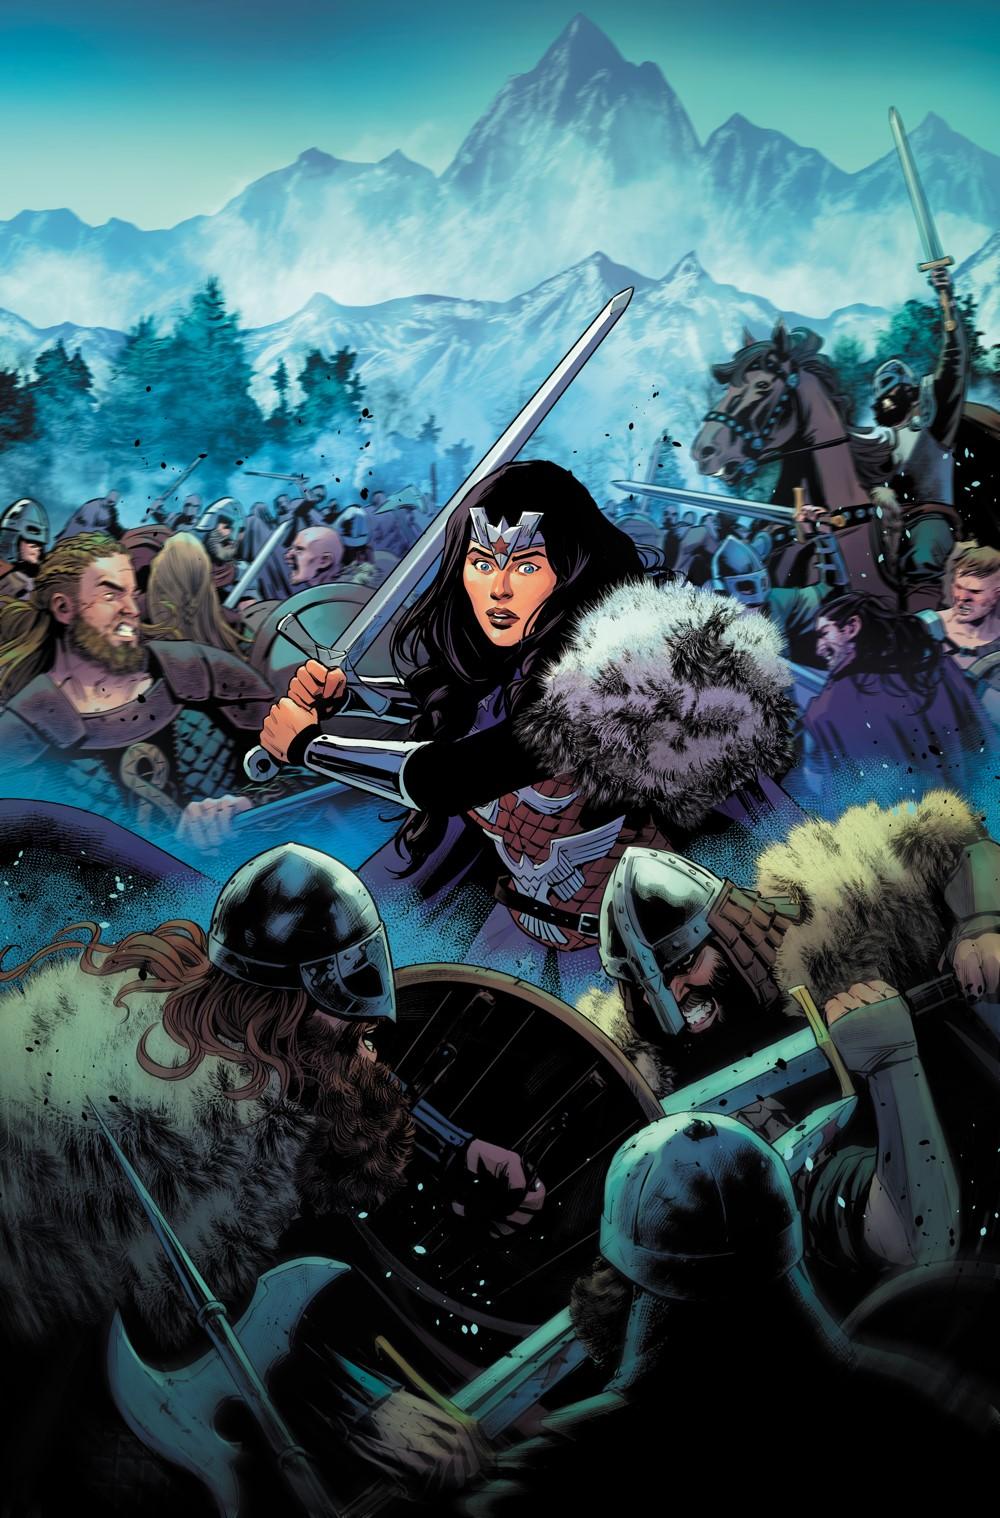 Wonder-Woman-Vol-1-Afterworlds-trade DC Comics November 2021 Solicitations